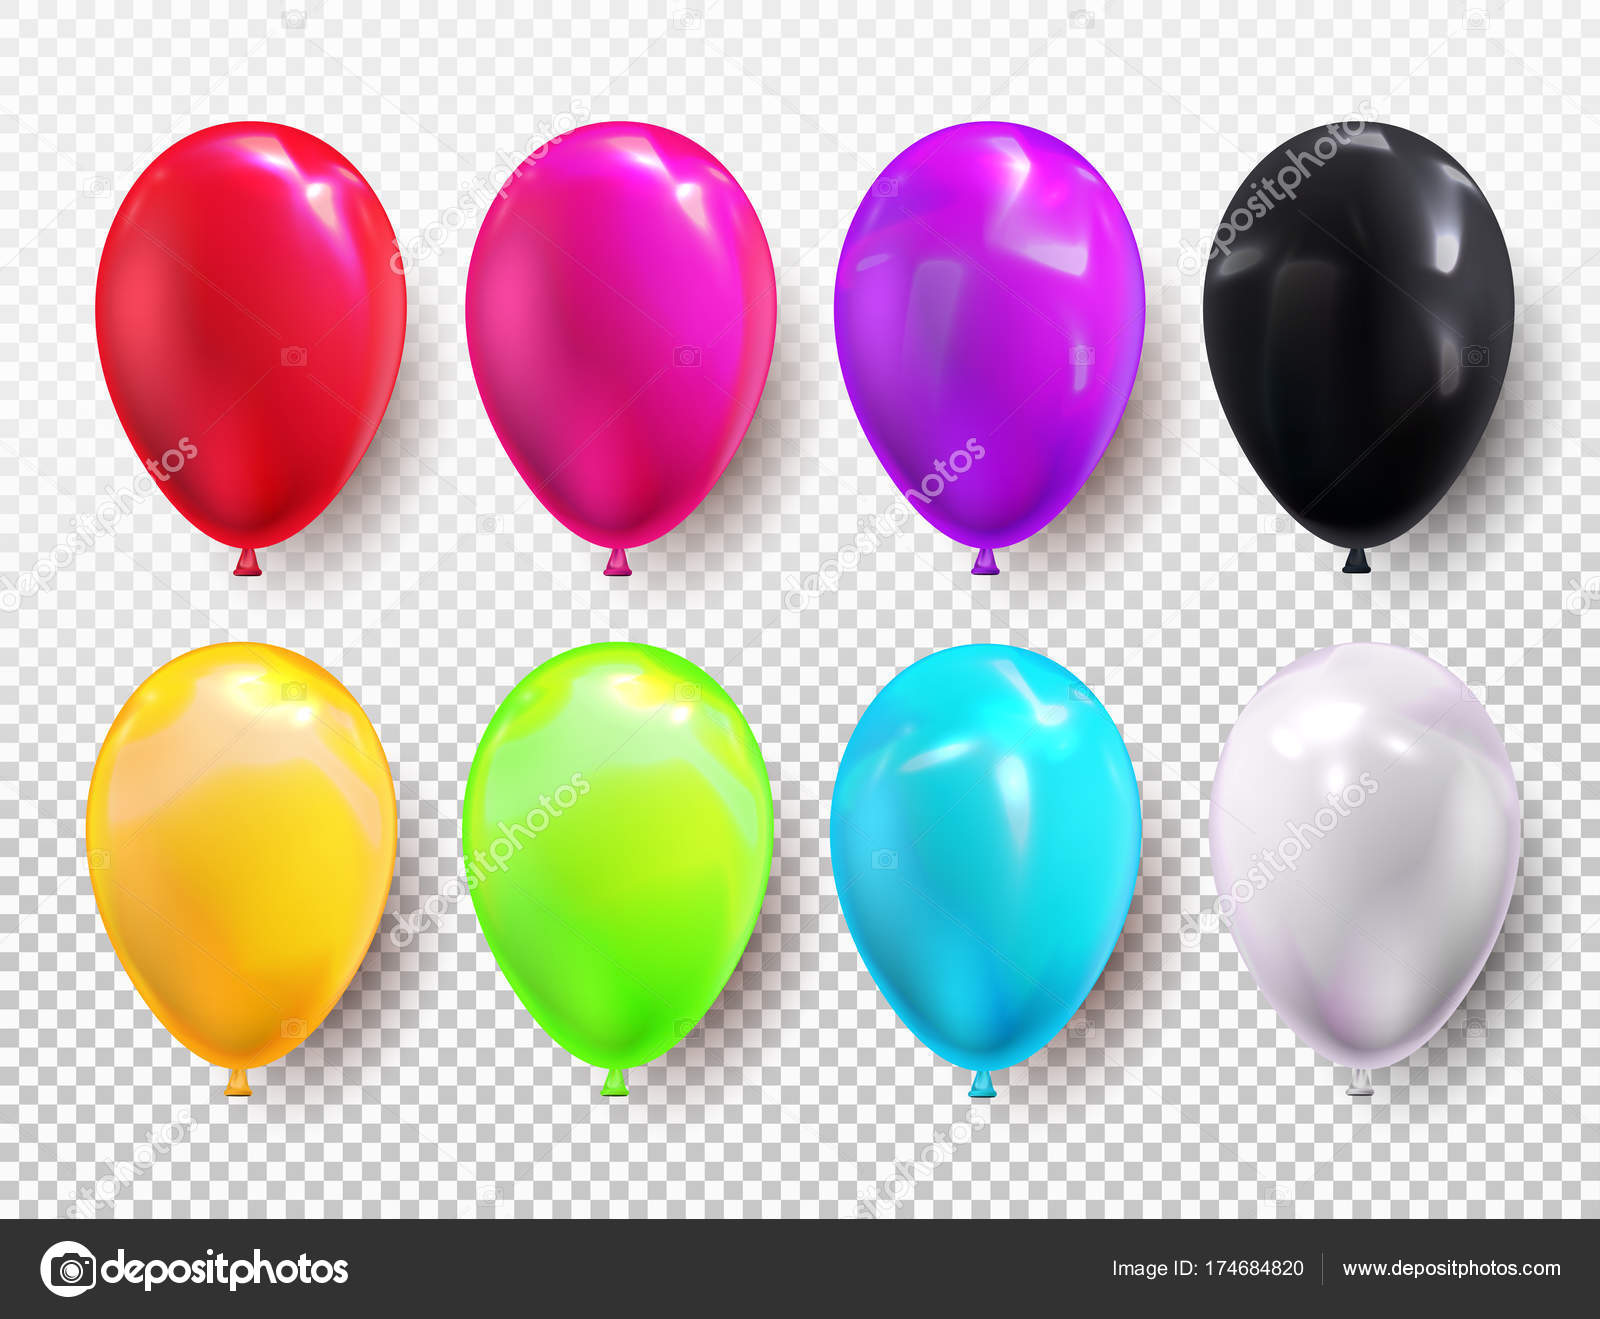 Heliumballon festgelegten Farben. Geburtstag Ballons rot, gelb, grün ...